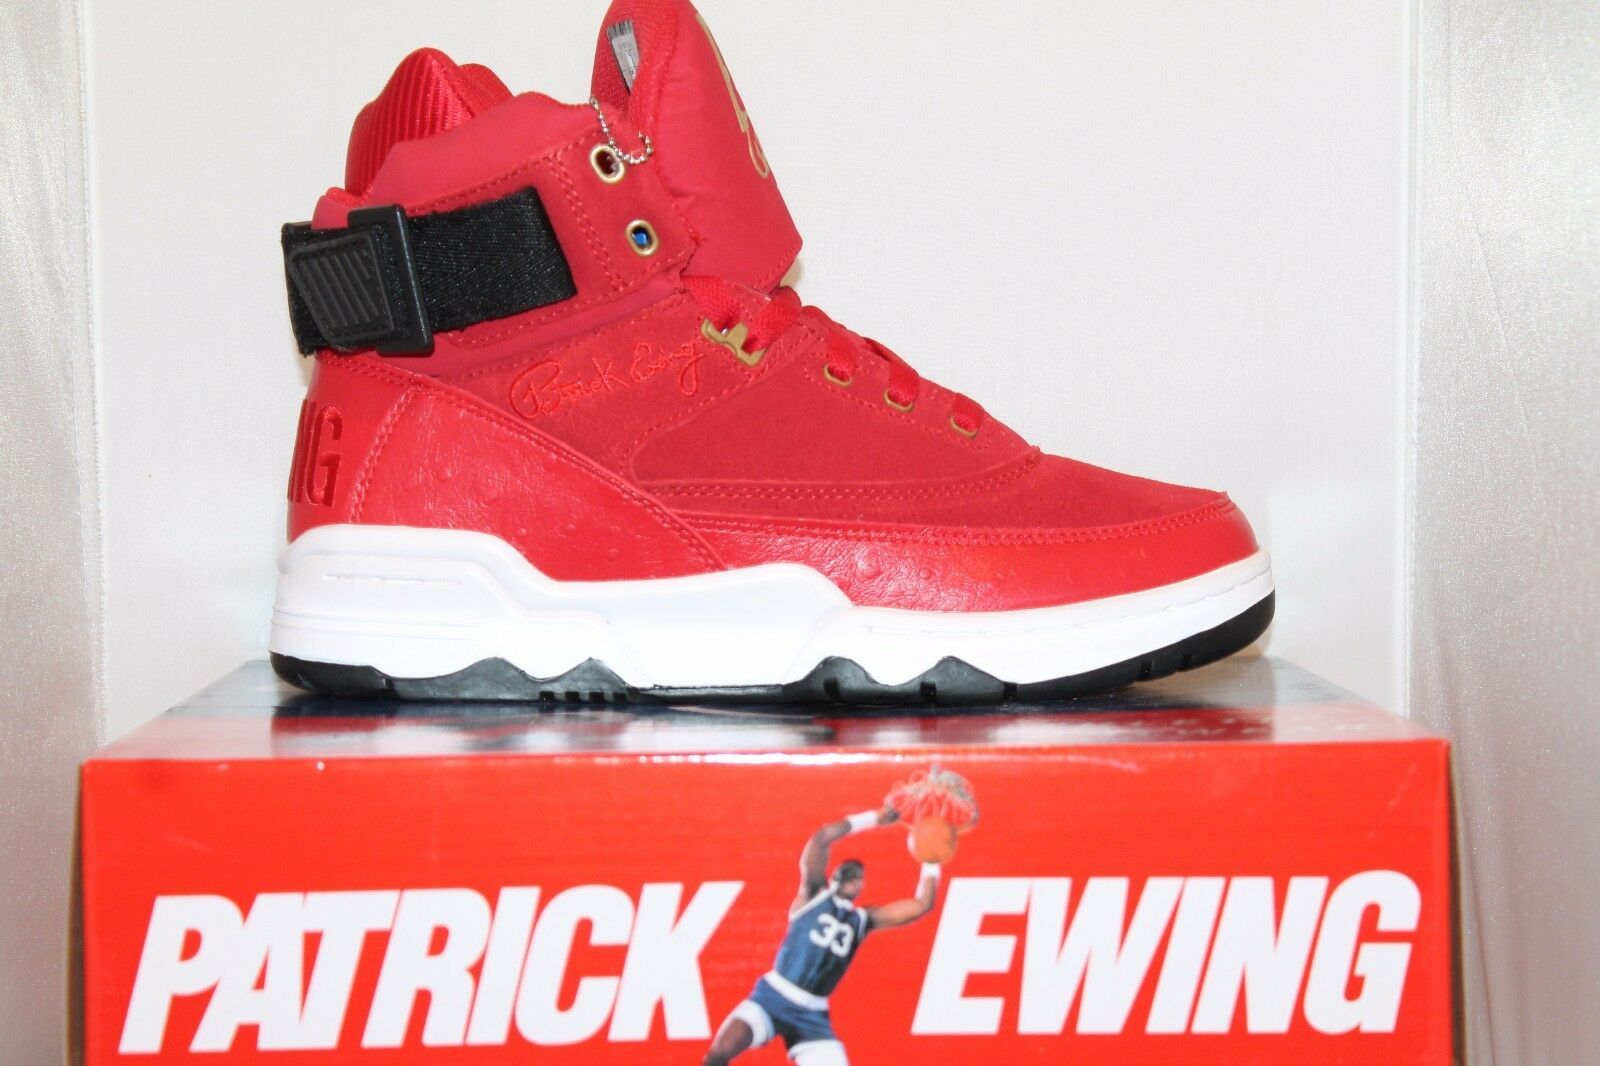 Mens Patrick Ewing Athletics 33 HI Retro Basketball Shoes Red Black White Gold